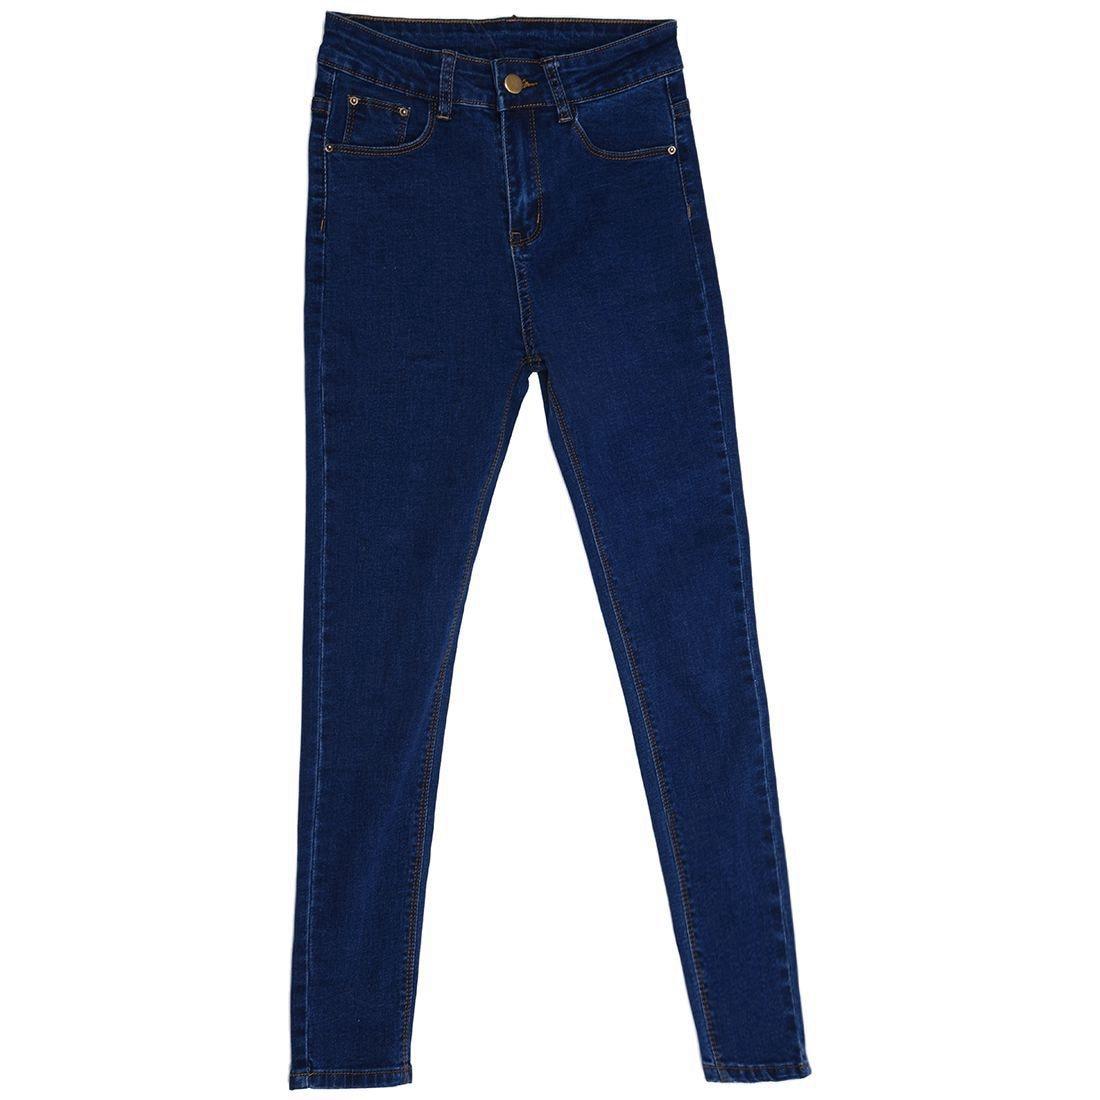 Woman's new fashion brand women skinny pencil jeans denim elastic pants washing color good quality woman casual jean pants(dar